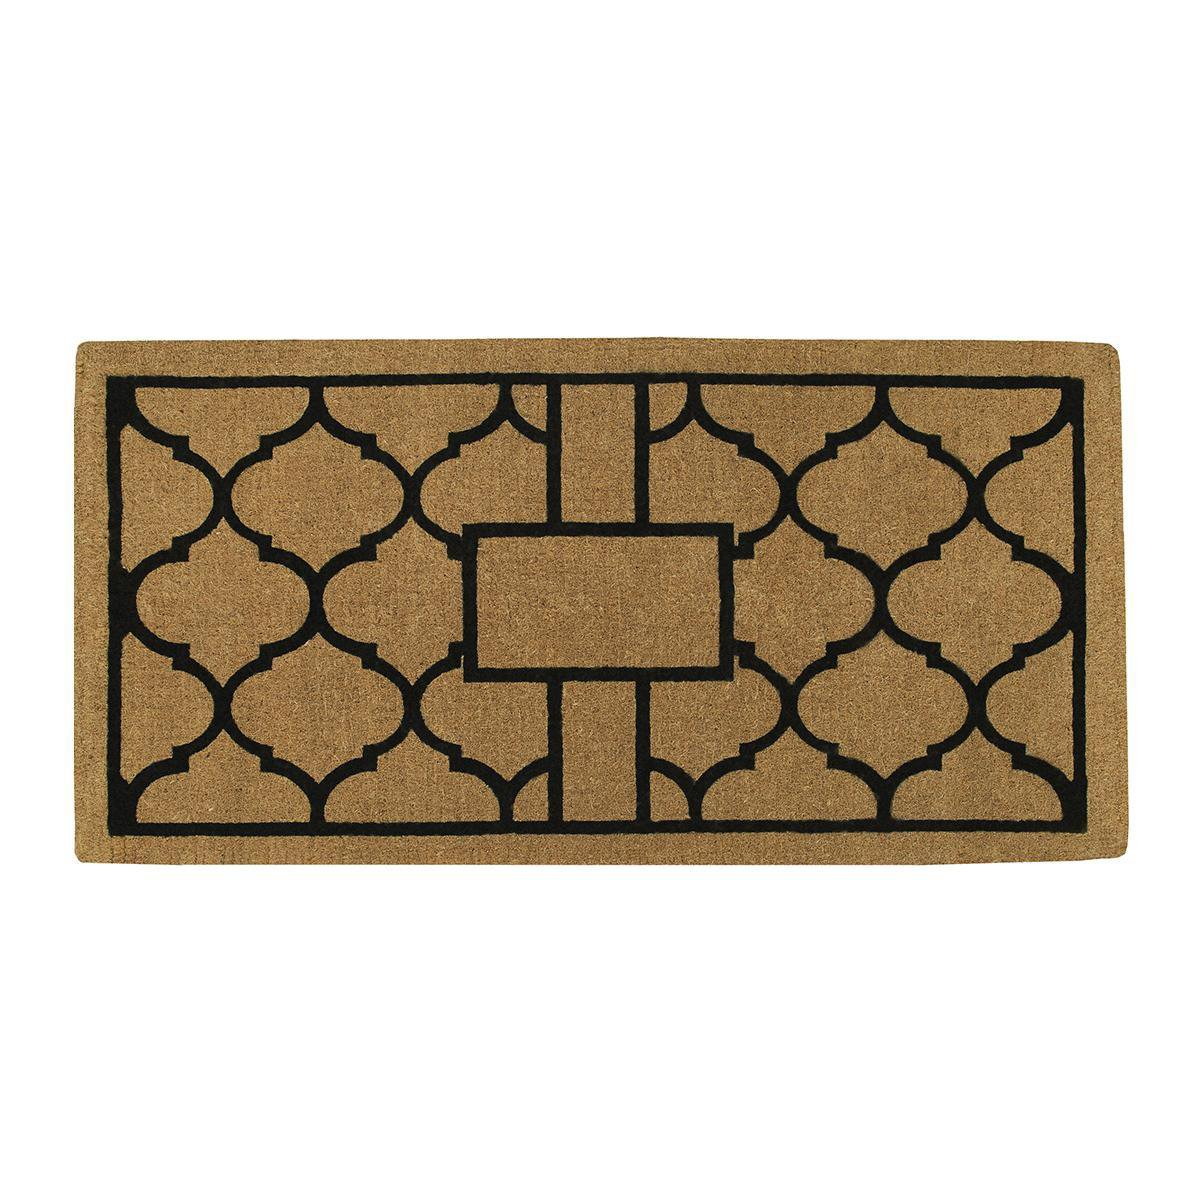 Home & More 18008PLAIN3672 Pantera Extra-Thick Doormat, 36'' x 72'' x 1.50'' , Natural/Black